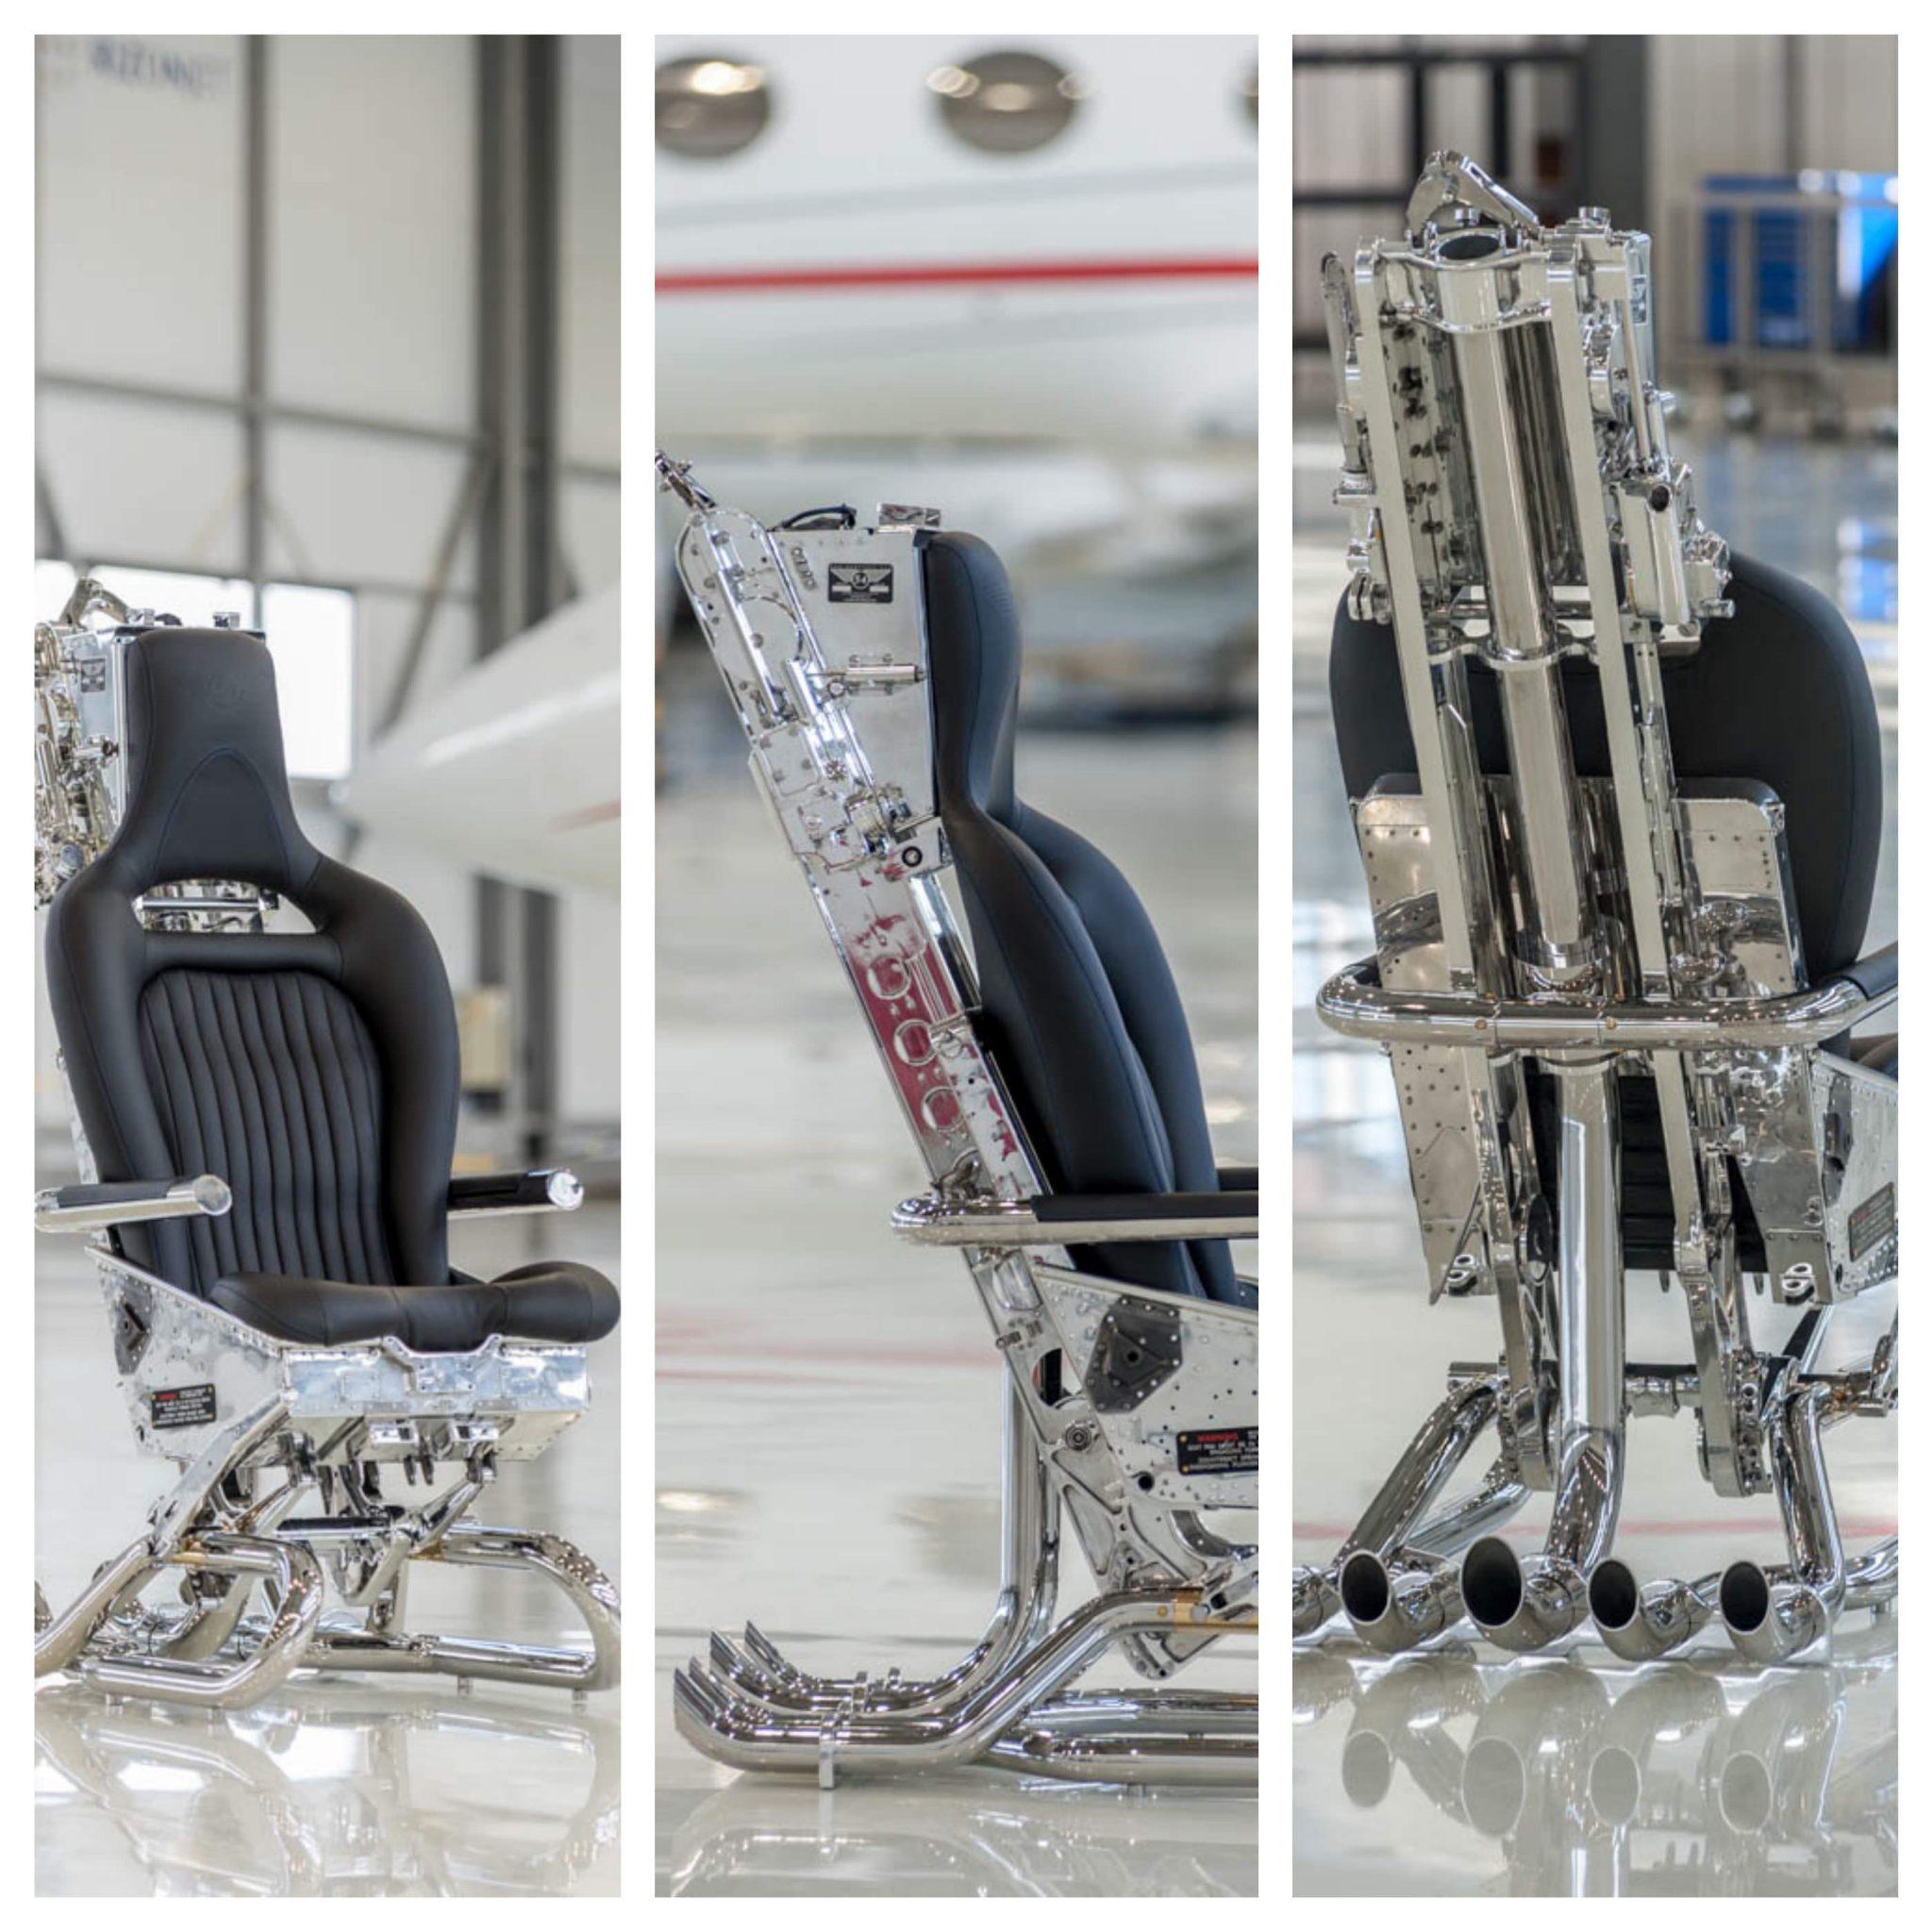 ejection seat office chair memory foam by hangar 54